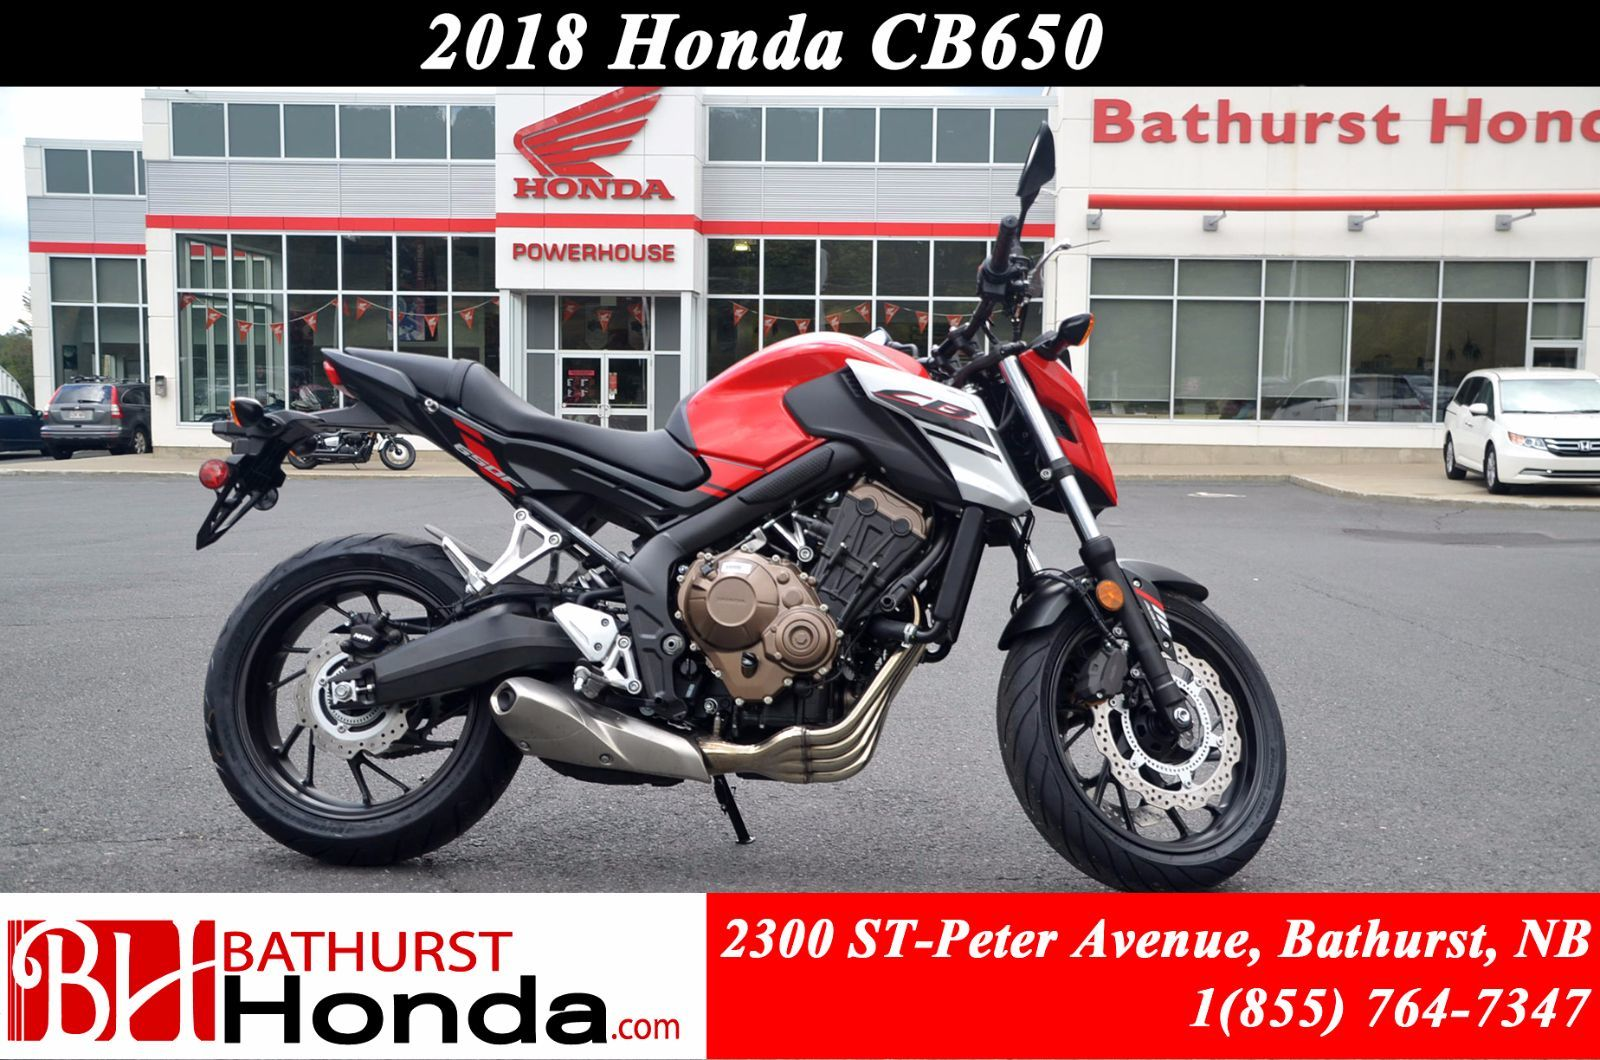 Honda Certified Pre Owned >> New 2018 Honda CB650 at Bathurst Honda | #B8015